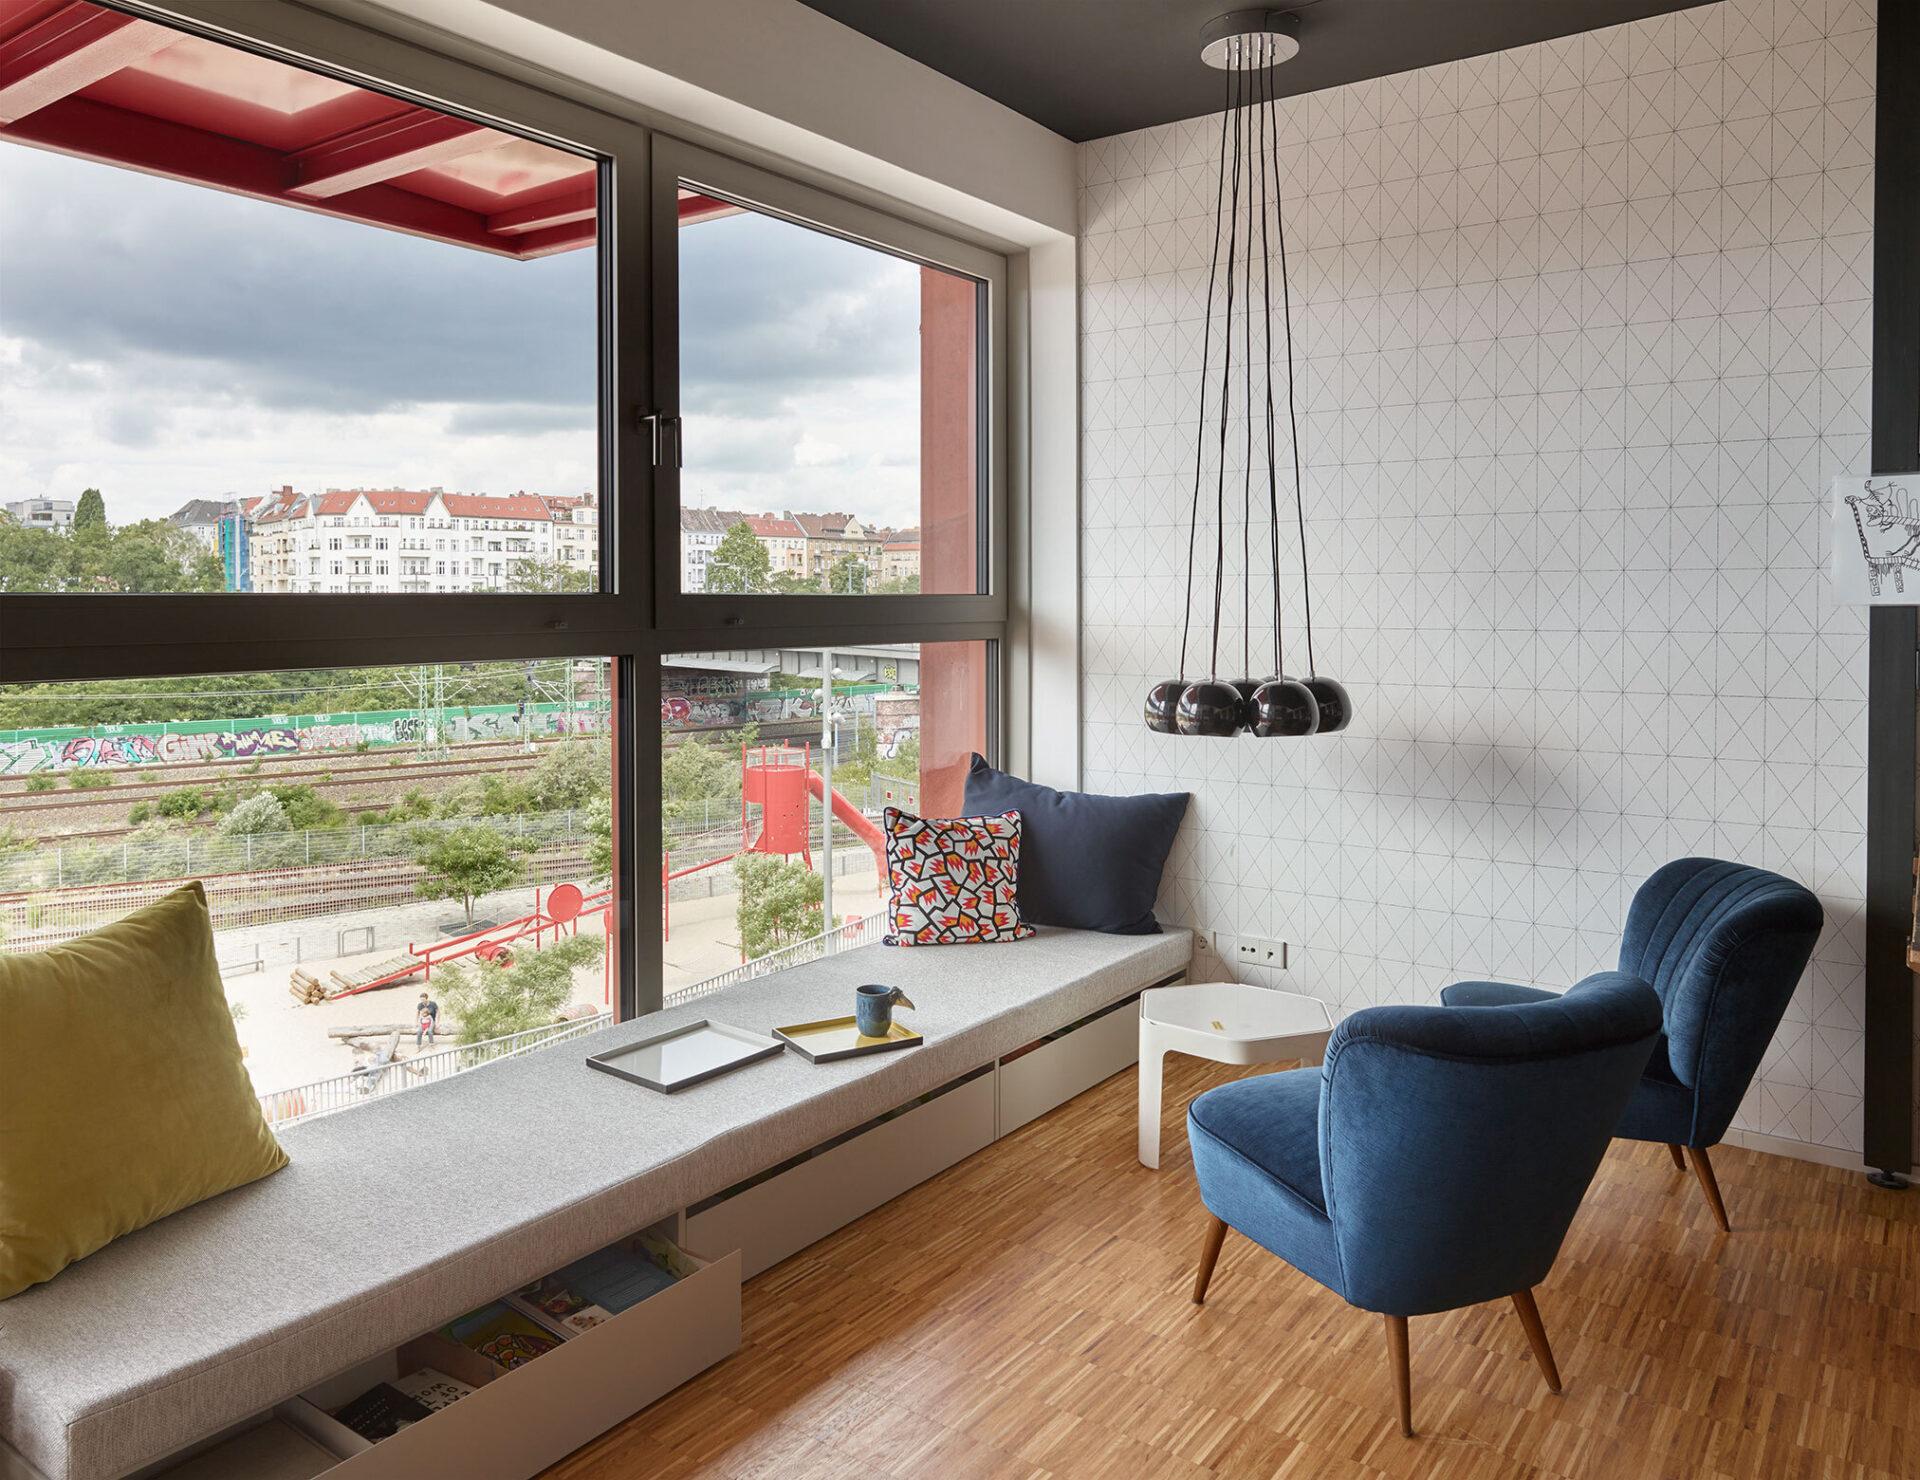 Antonius Schimmelbusch_Apartment Berlin_Ragnar Schmuck_privat_15